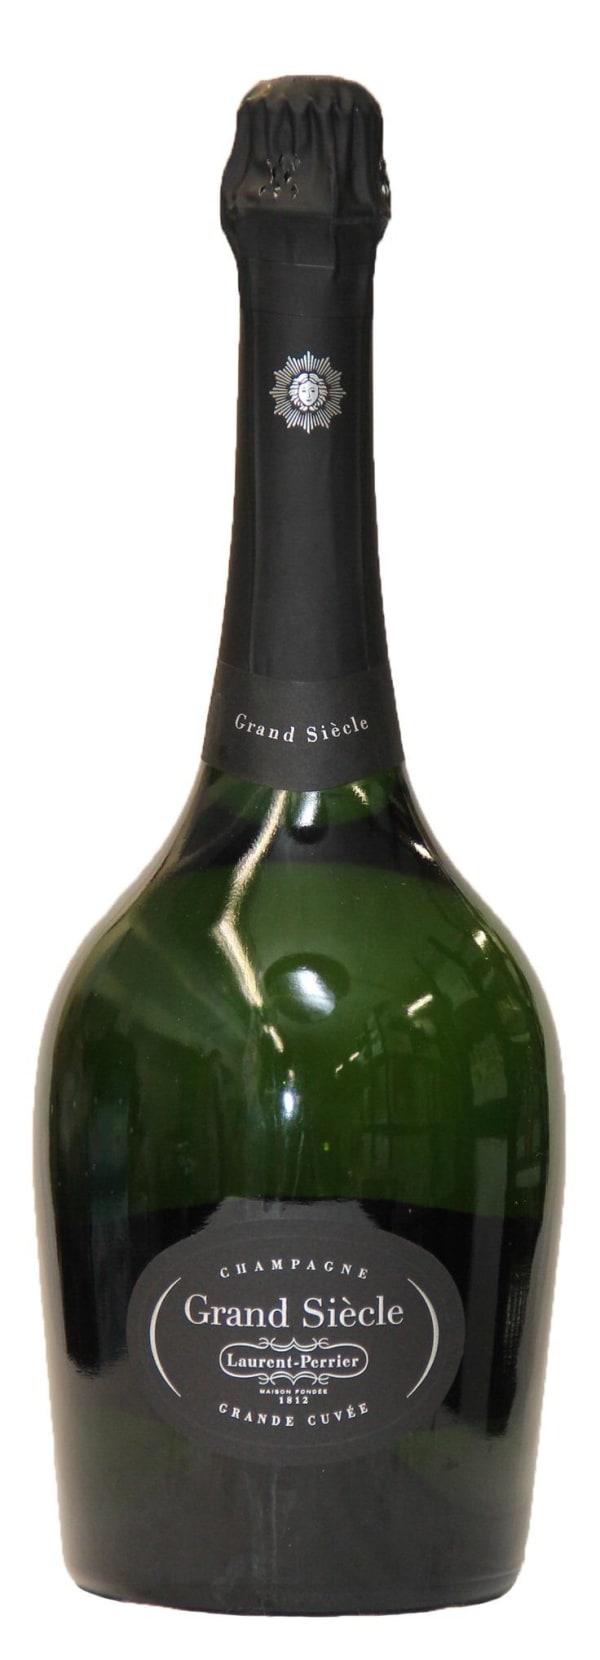 Laurent-Perrier Grand Siècle Champagne Brut